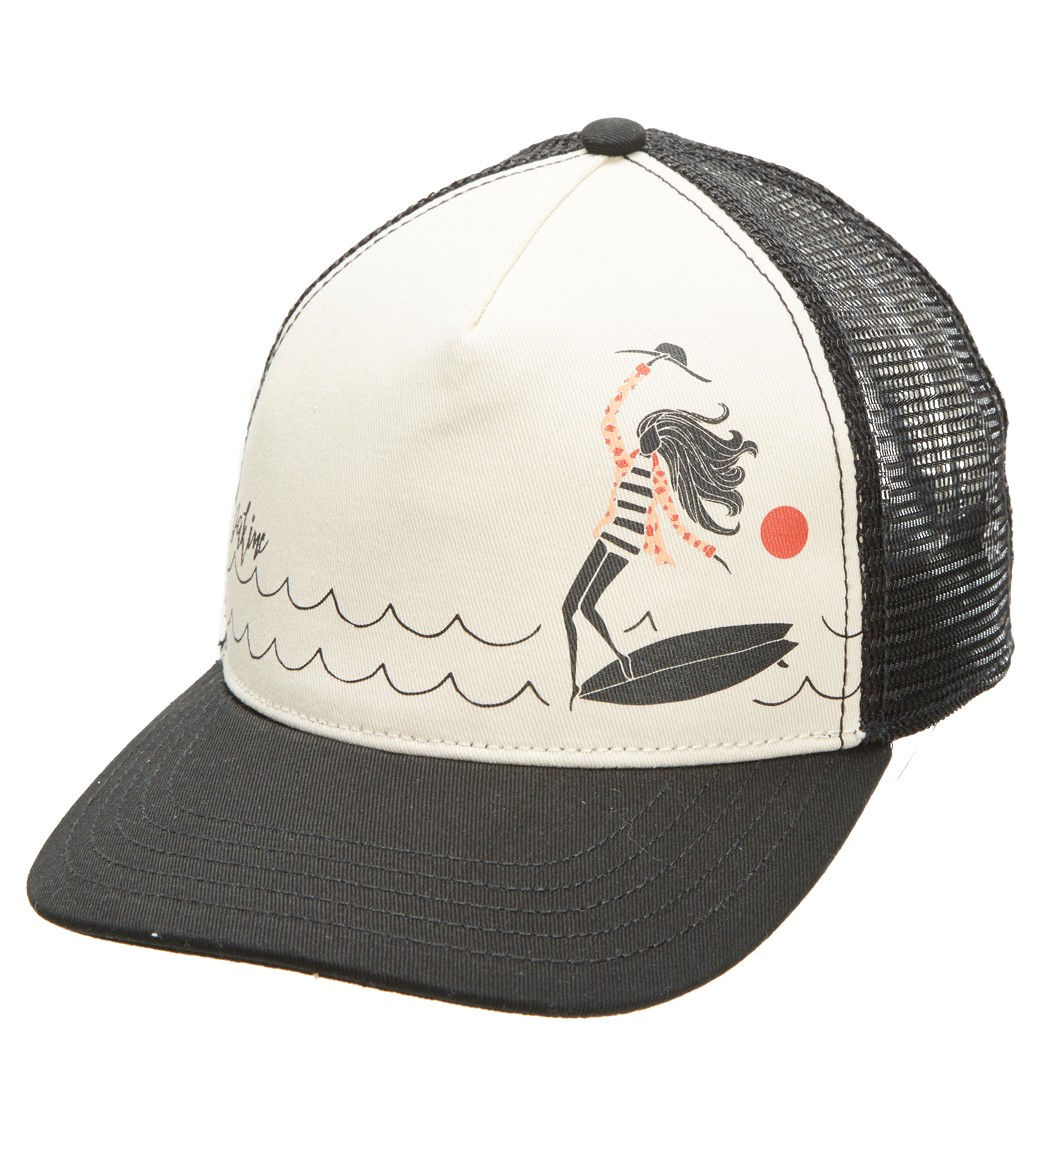 6746b4a5a72 Dakine Women s Lizzy Trucker Hat at SwimOutlet.com